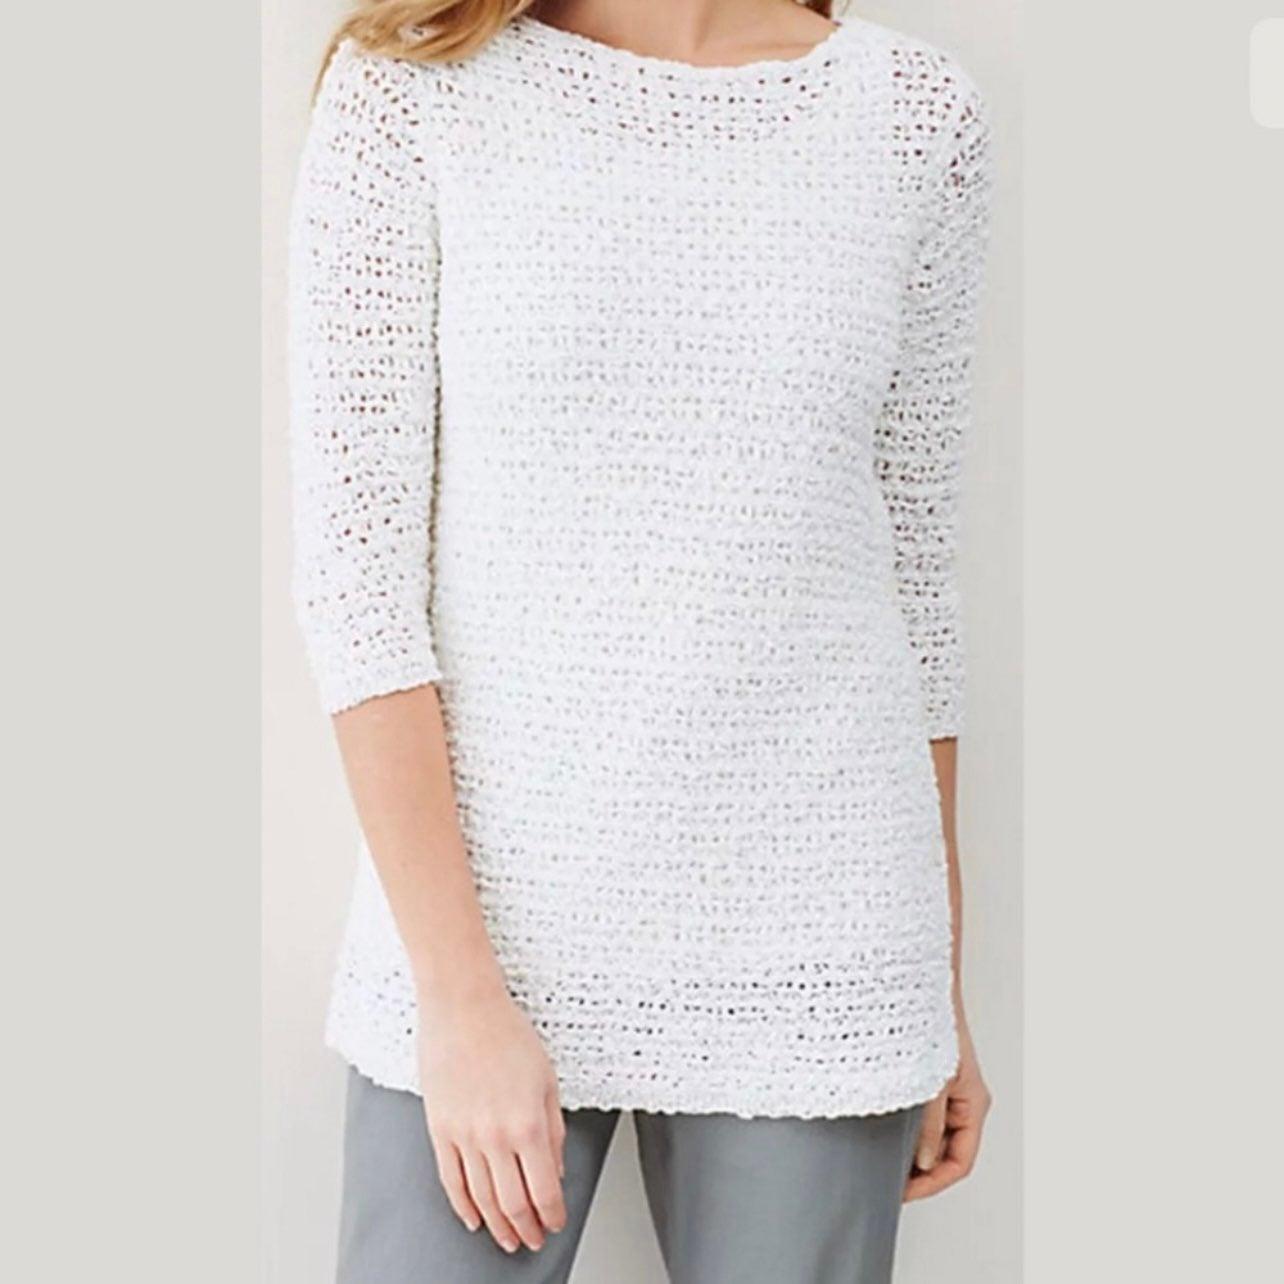 J. Jill Open Stitch Side Buttons Sweater